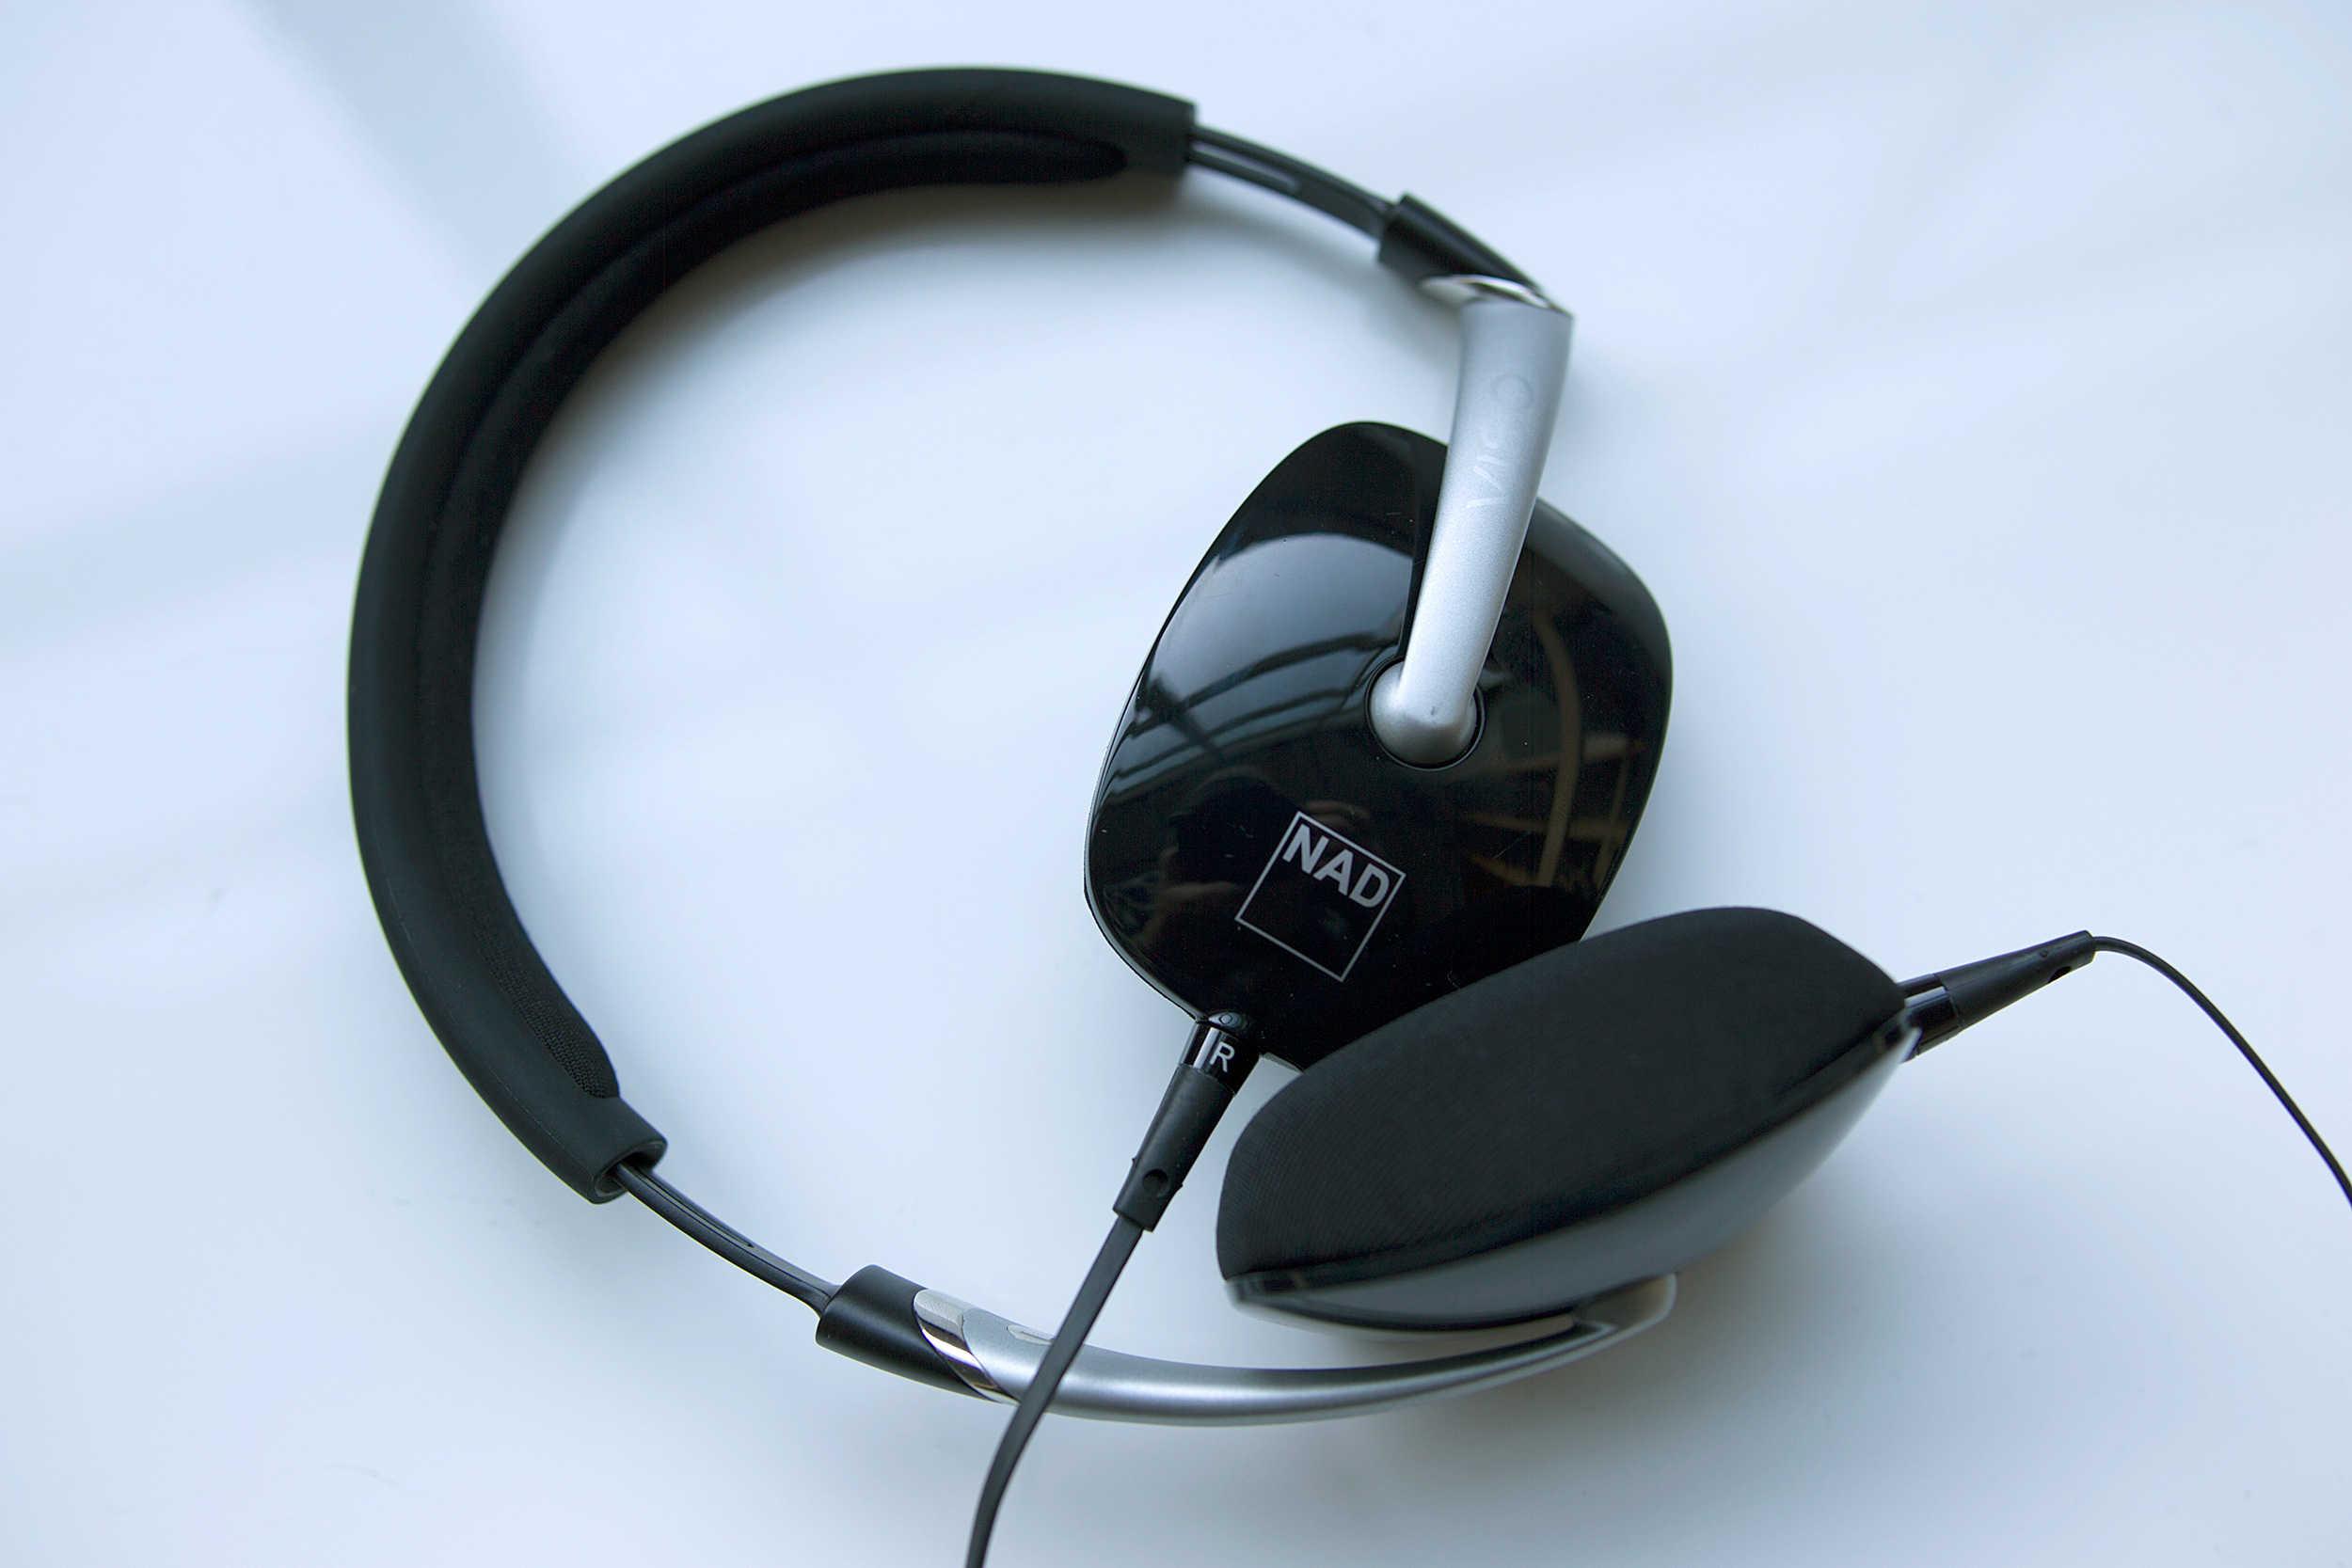 NAD VISO HP30 on-ear headphones offer RoomFeel technology.